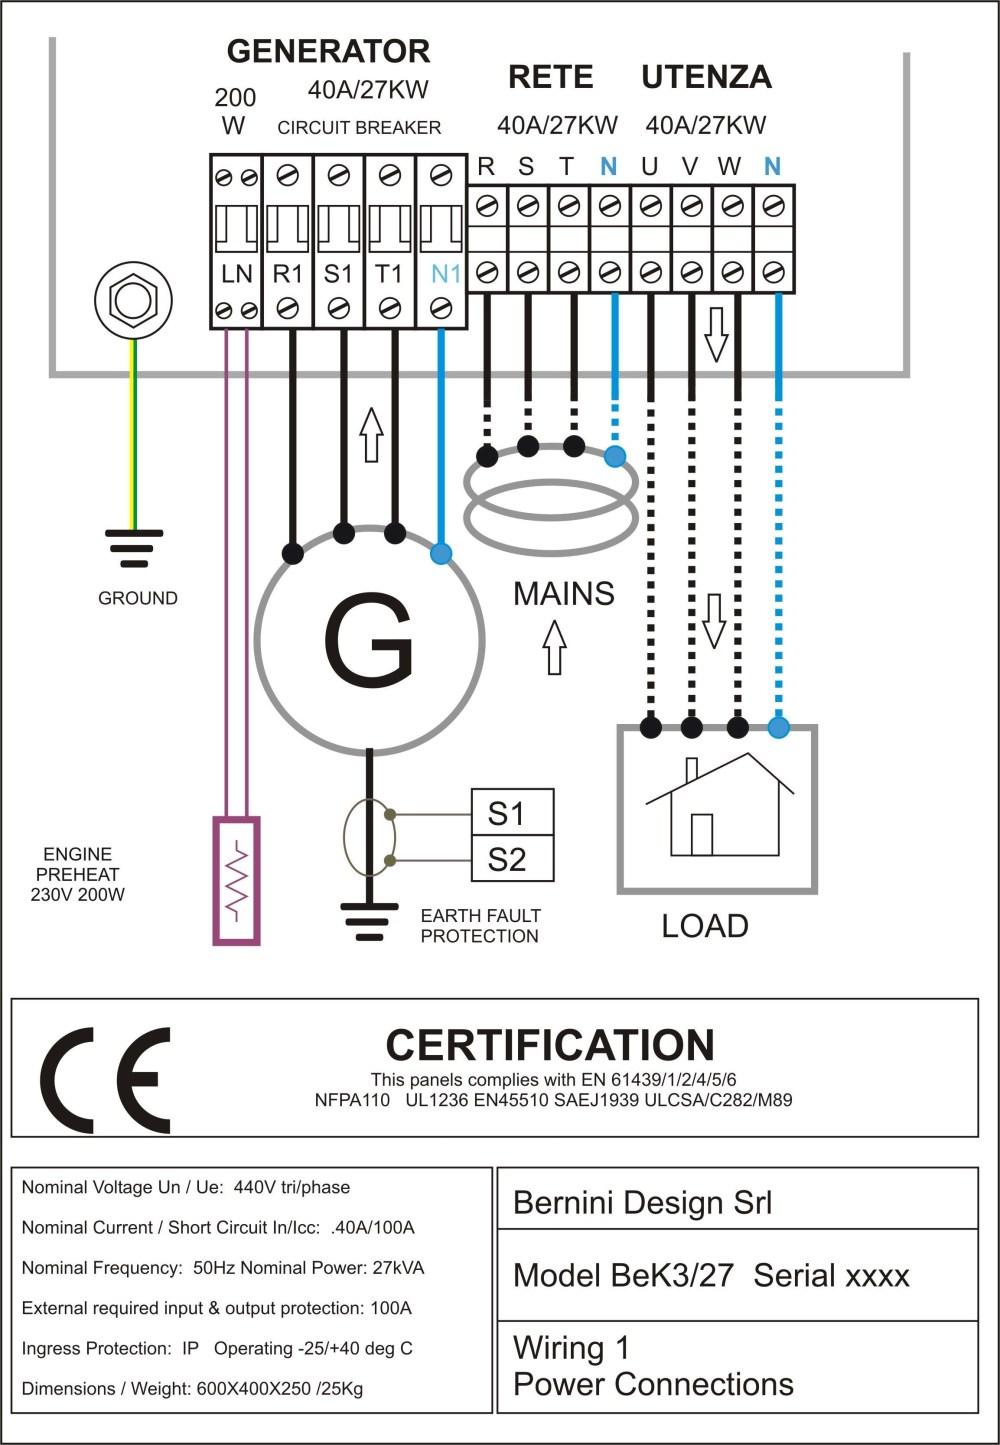 medium resolution of cummins diesel engine diagram sel generator control panel wiring diagram ac connections of cummins diesel engine cummins diesel engine diagram 1998 dodge